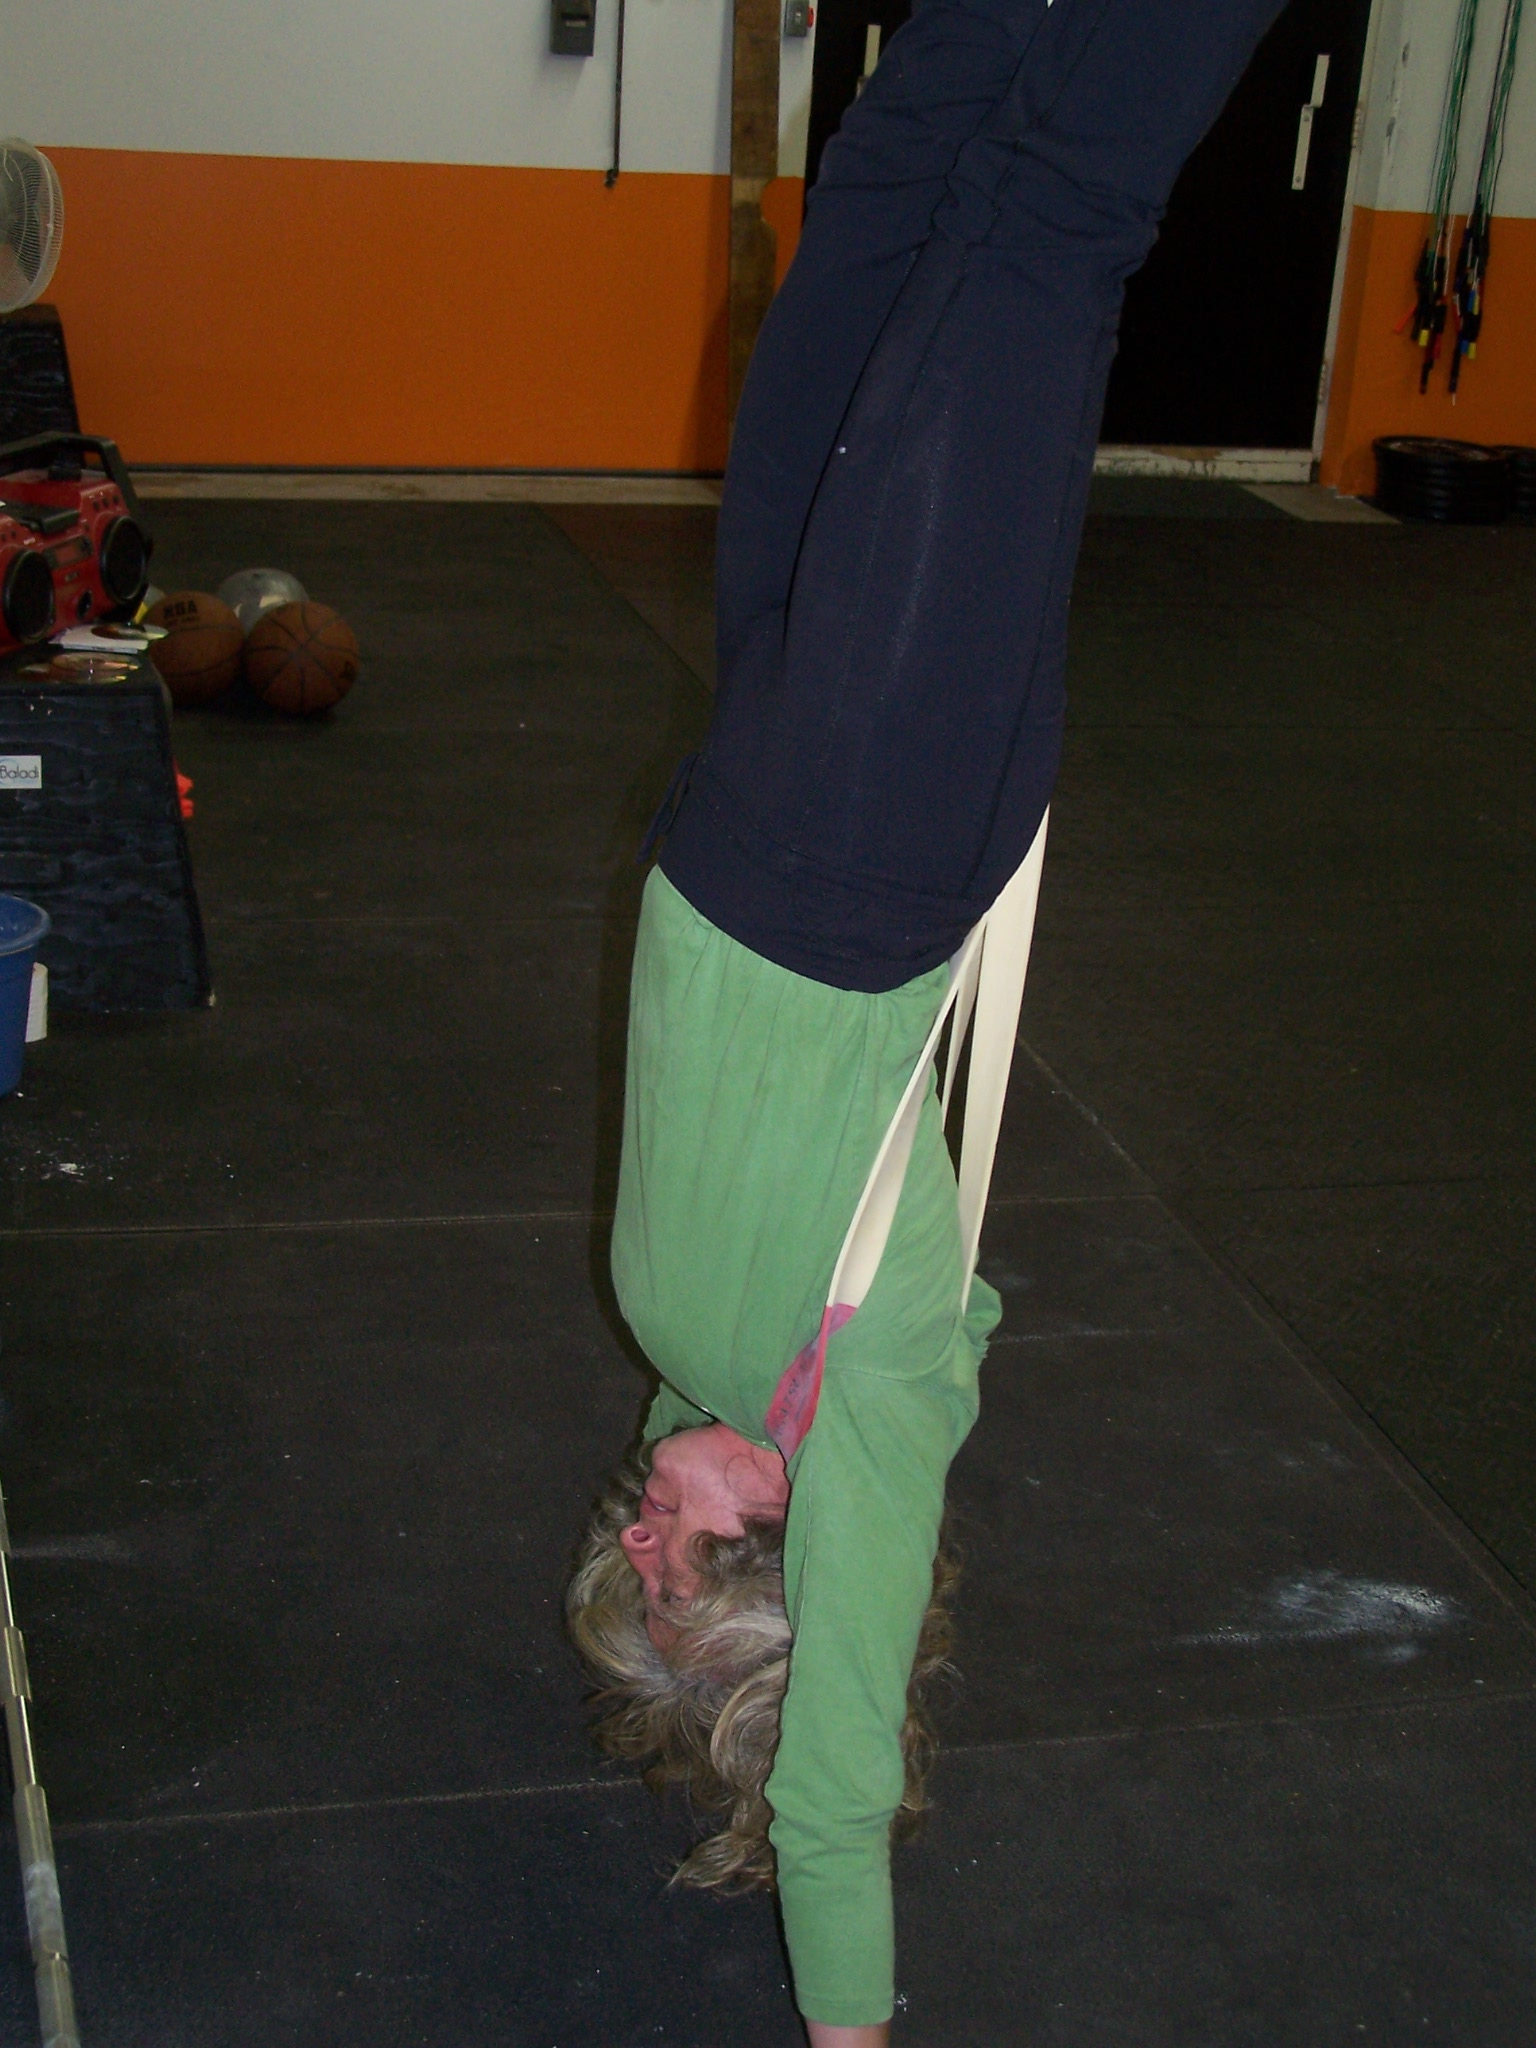 Julie working on some handstand pushups